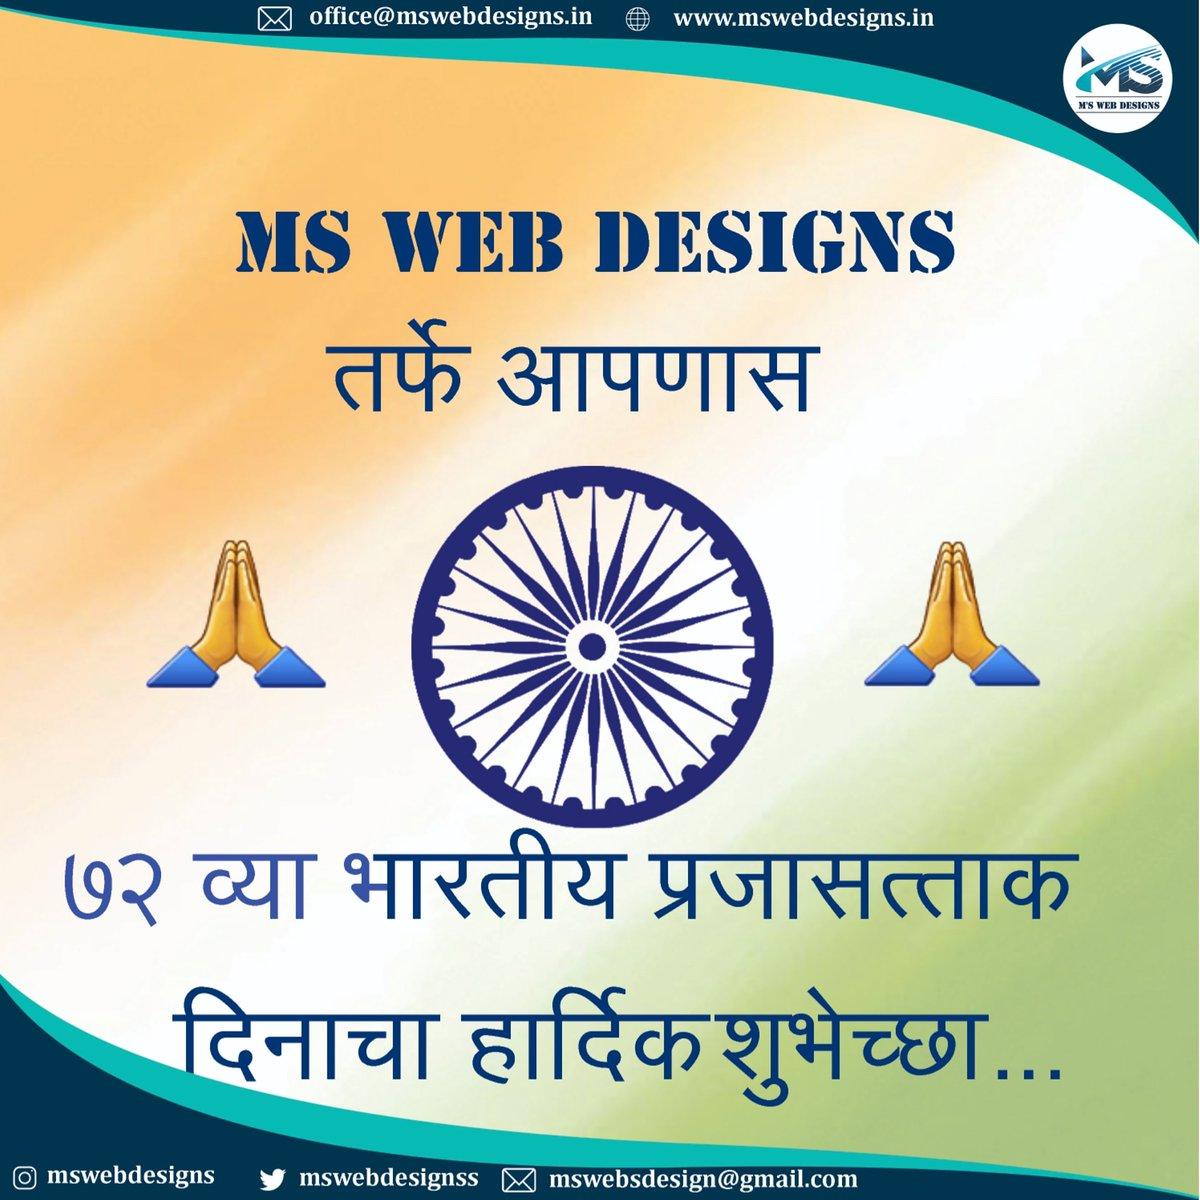 "🔷 M'S WebDesigns ""Where Creativity meets Design""  Visit:    #mswebdesigns #webdesigner #webdevelopment #webstagram #webdeveloper #websitedesign #engineering #business #businessowner #graphicdesign #graphicdesigner  #maharashtra"